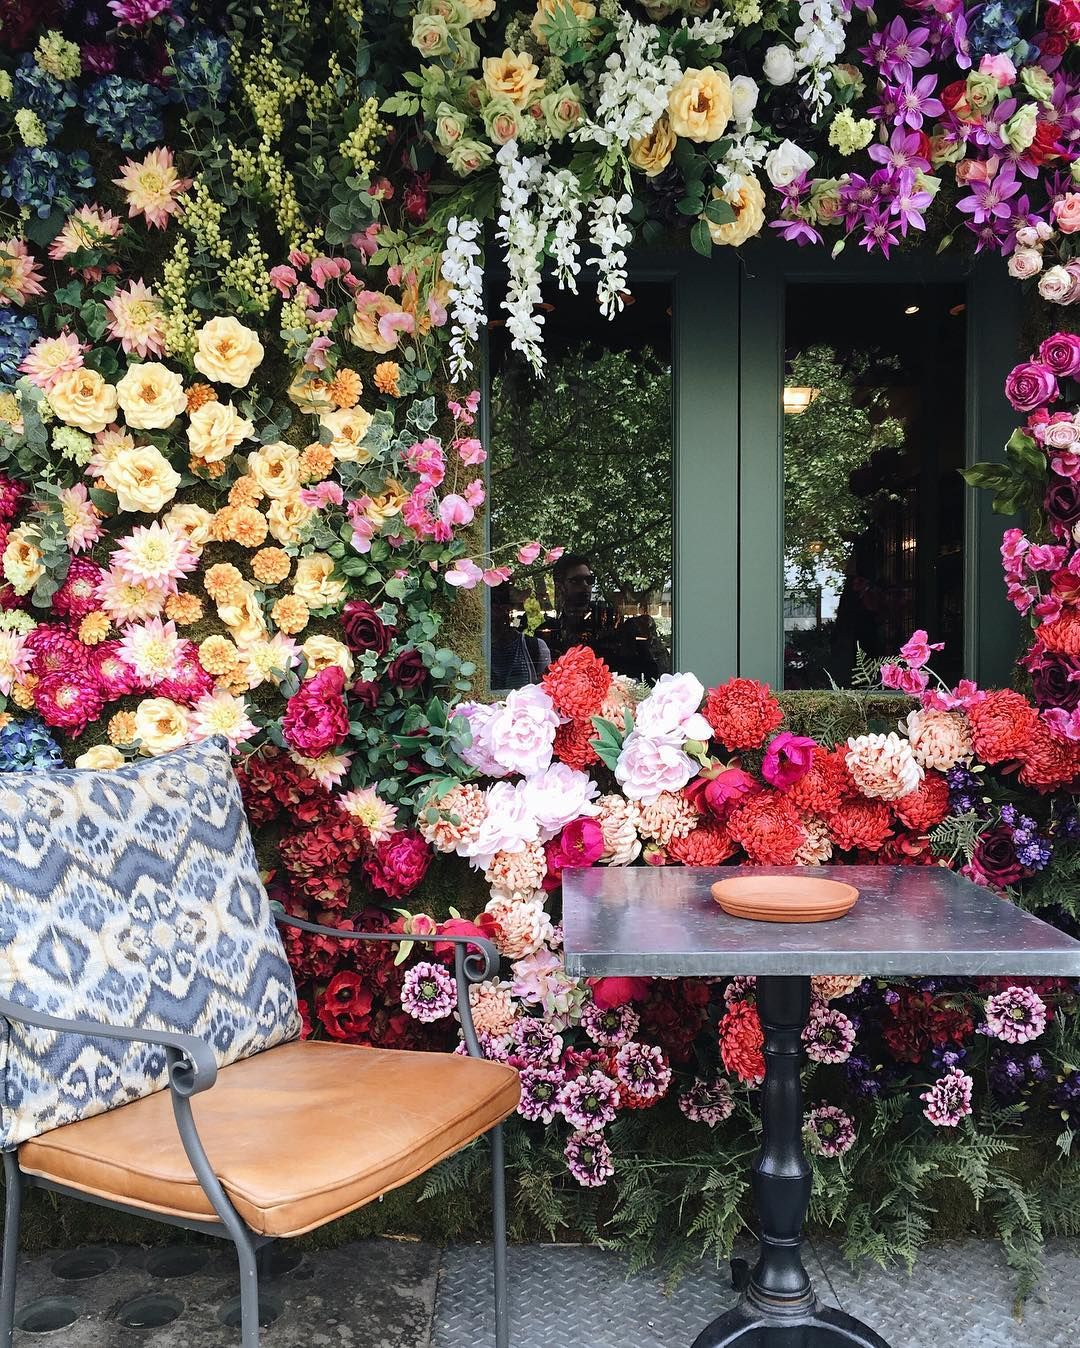 seaofatlas Chelsea garden, Flowers for everyone, The